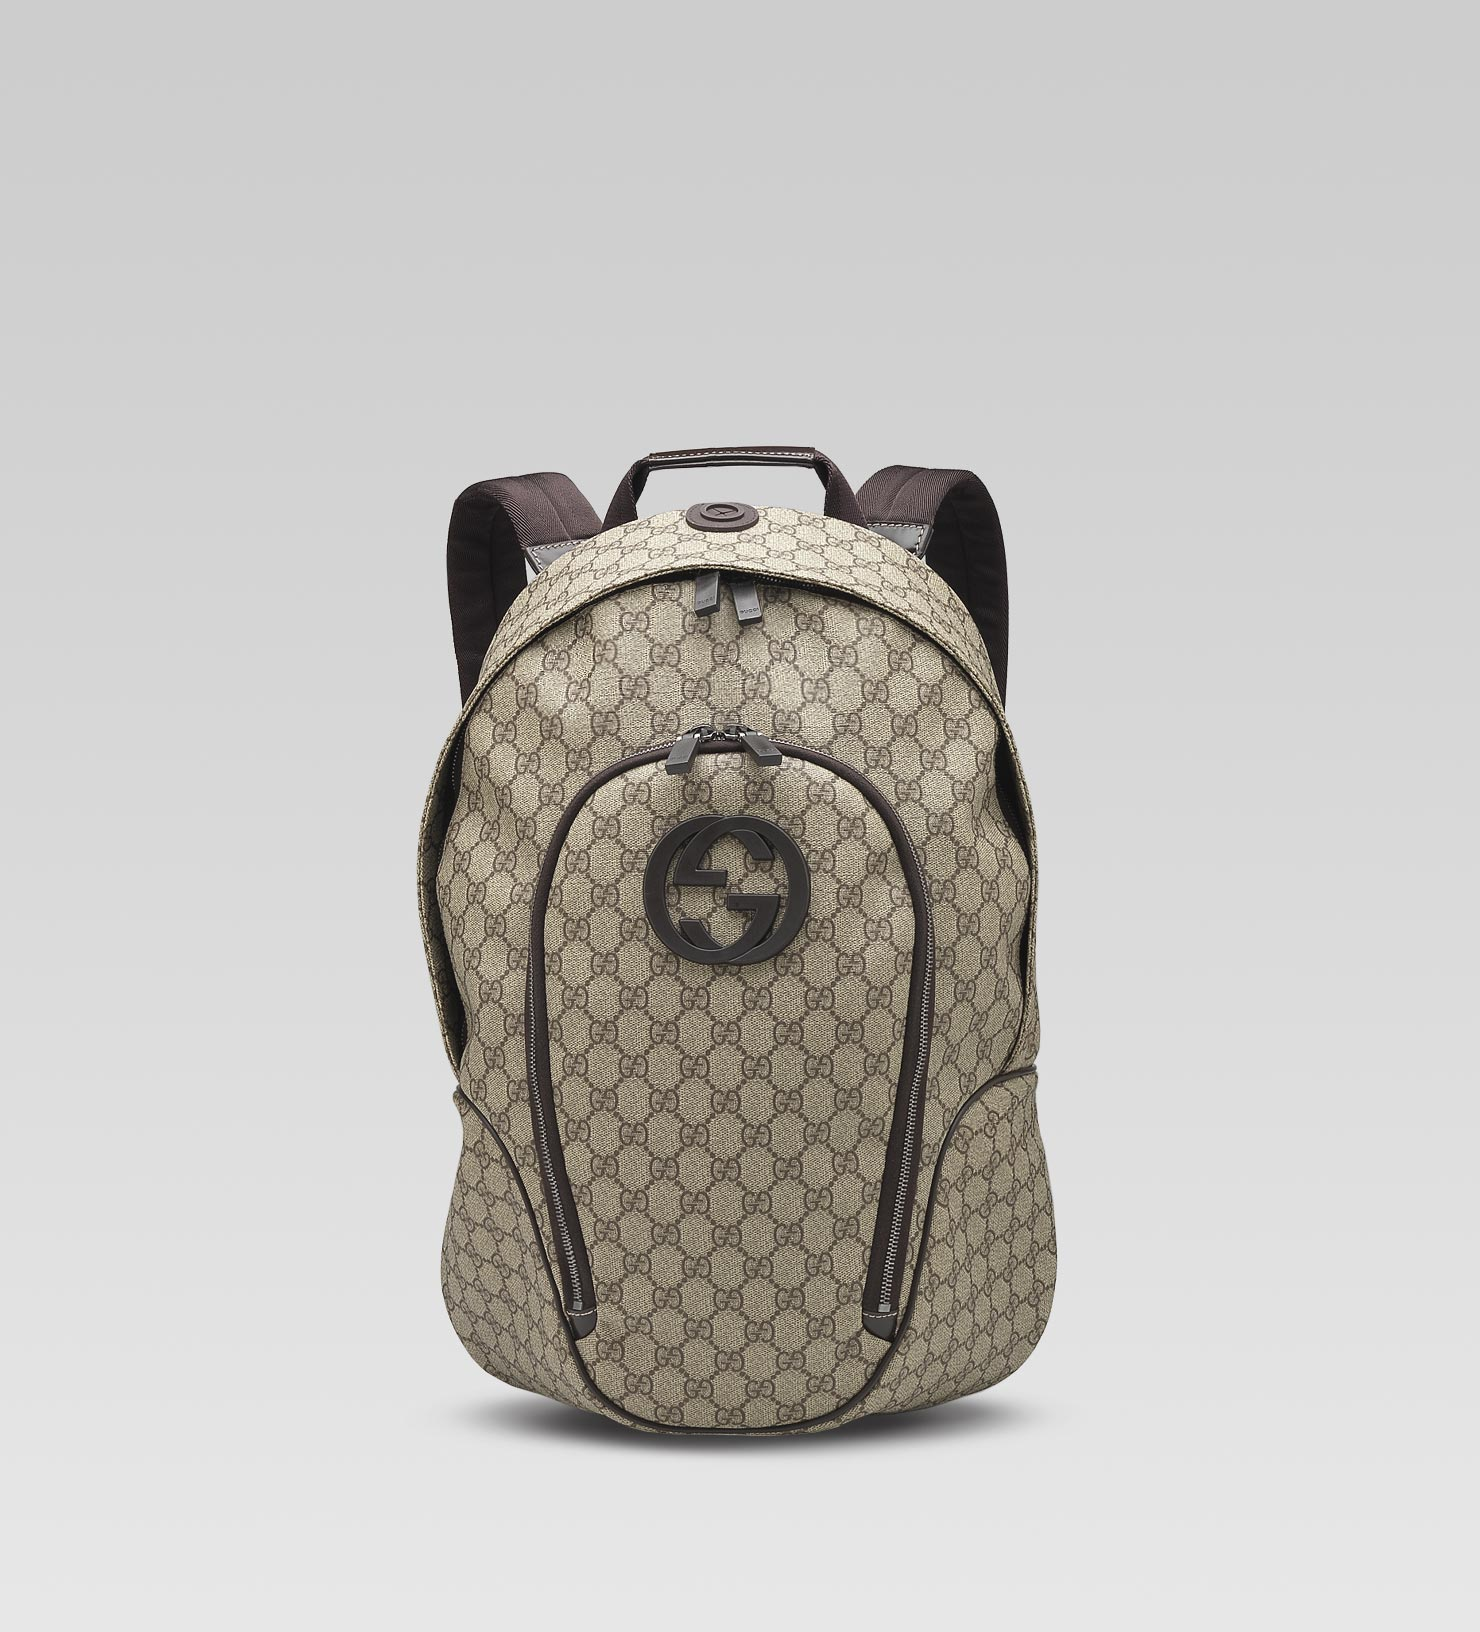 42e9f1e79951 Lyst - Gucci Interlocking G Backpack in Gray for Men